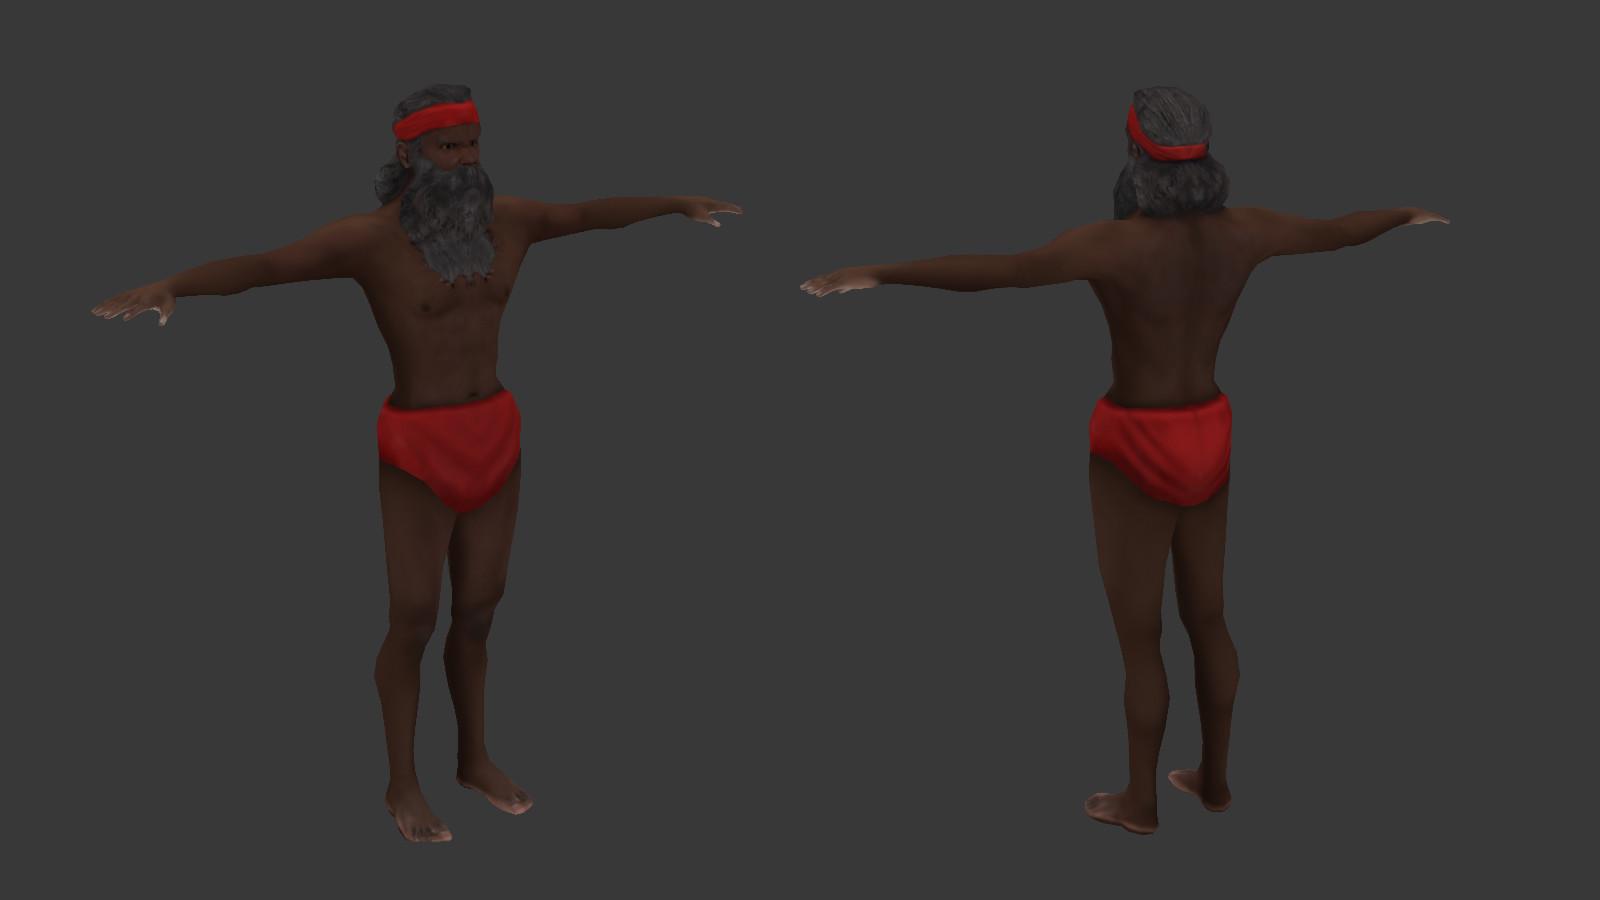 Oziel leal salinas african elder 2